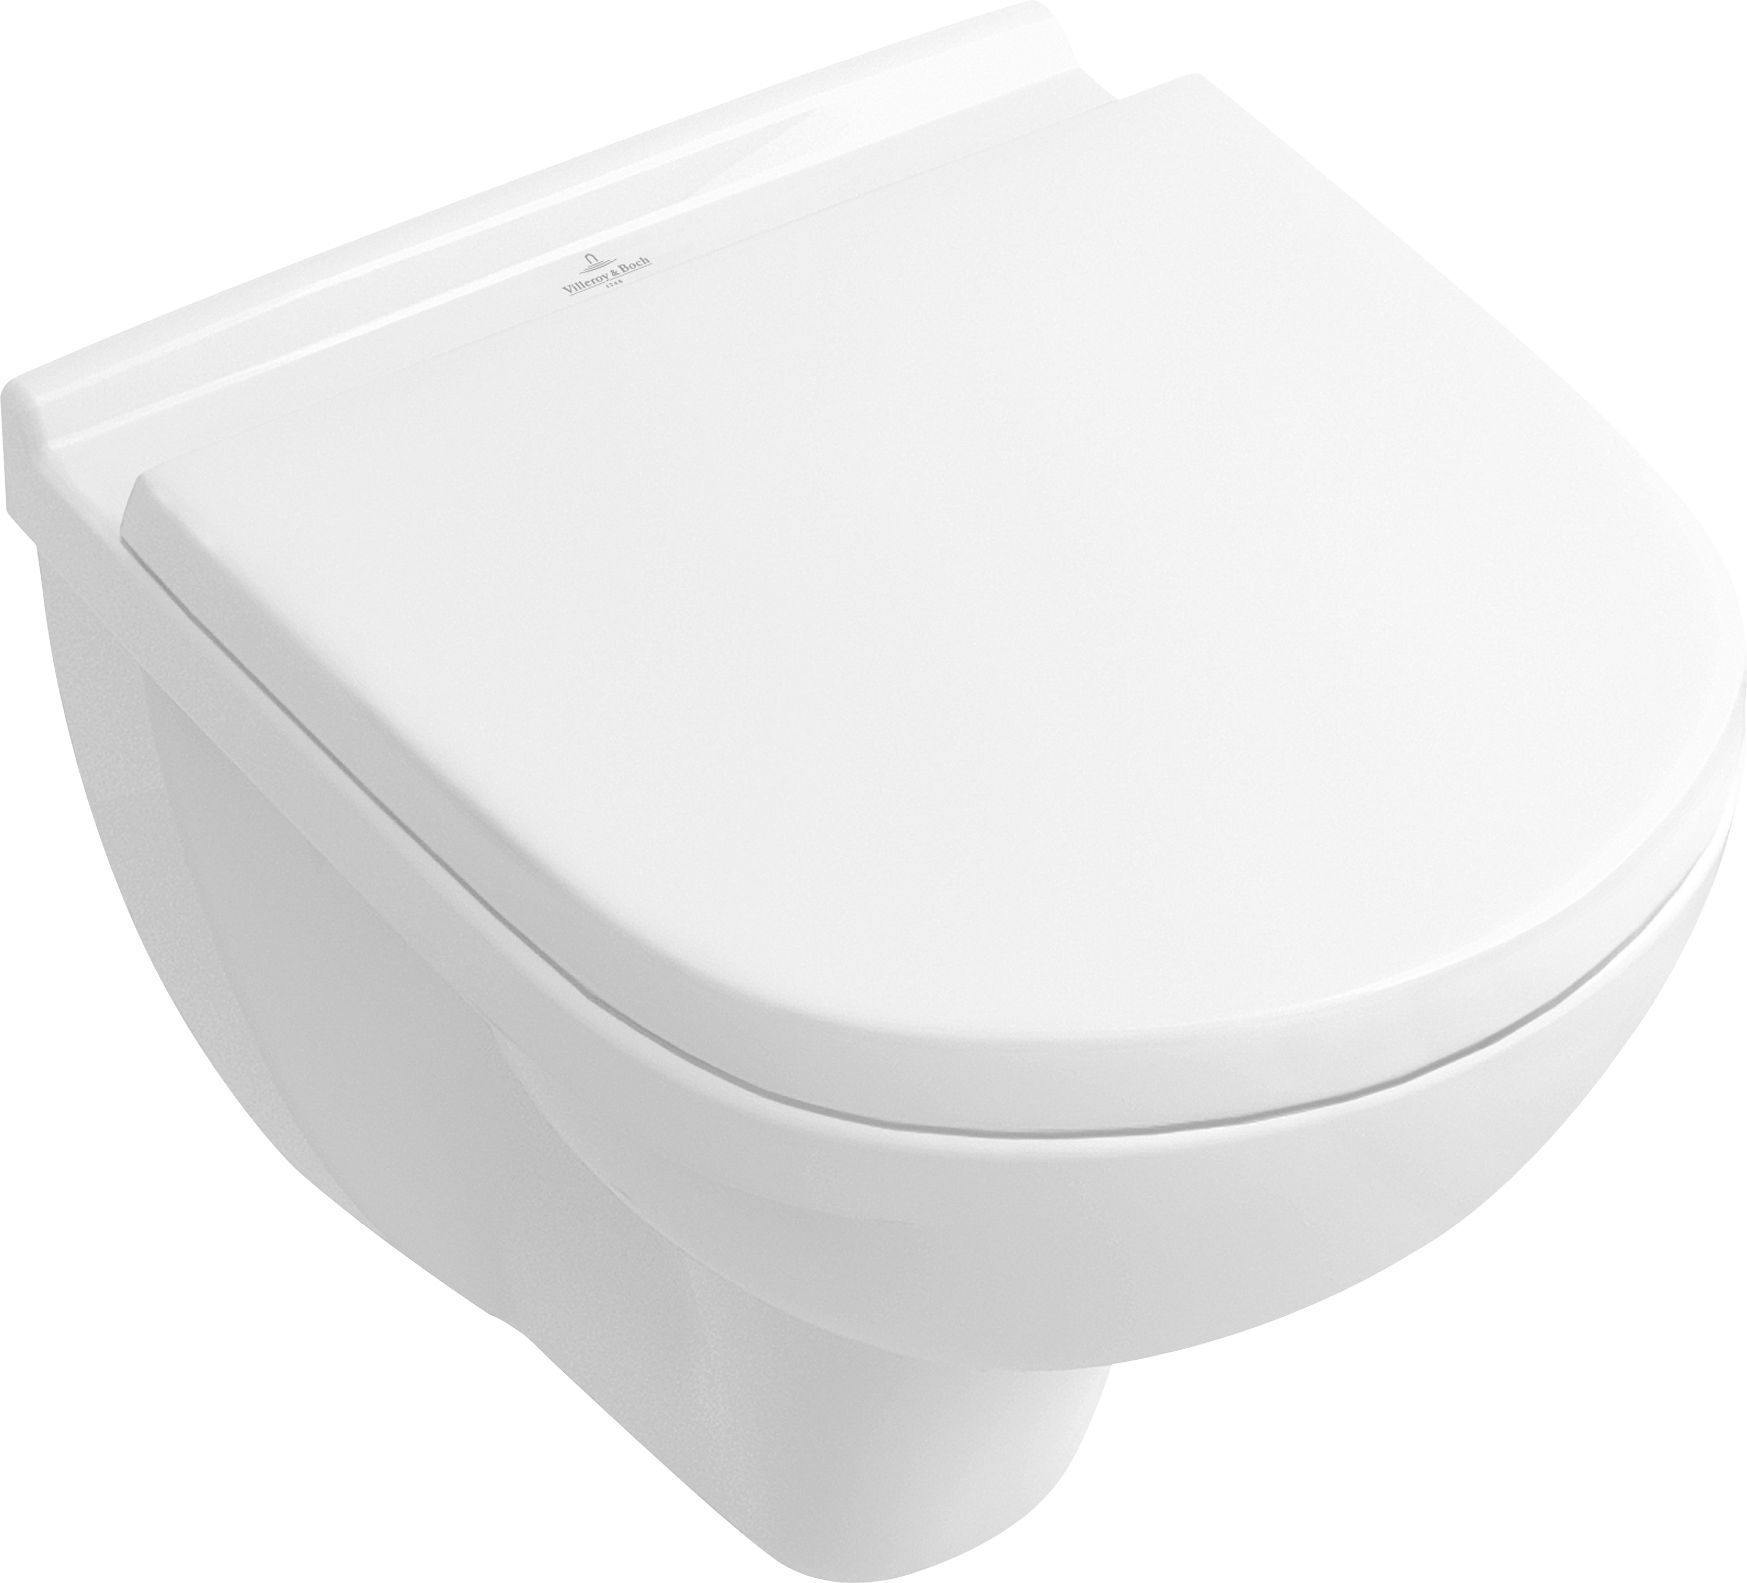 Villeroy & Boch O.novo WC-Sitz 9M406101